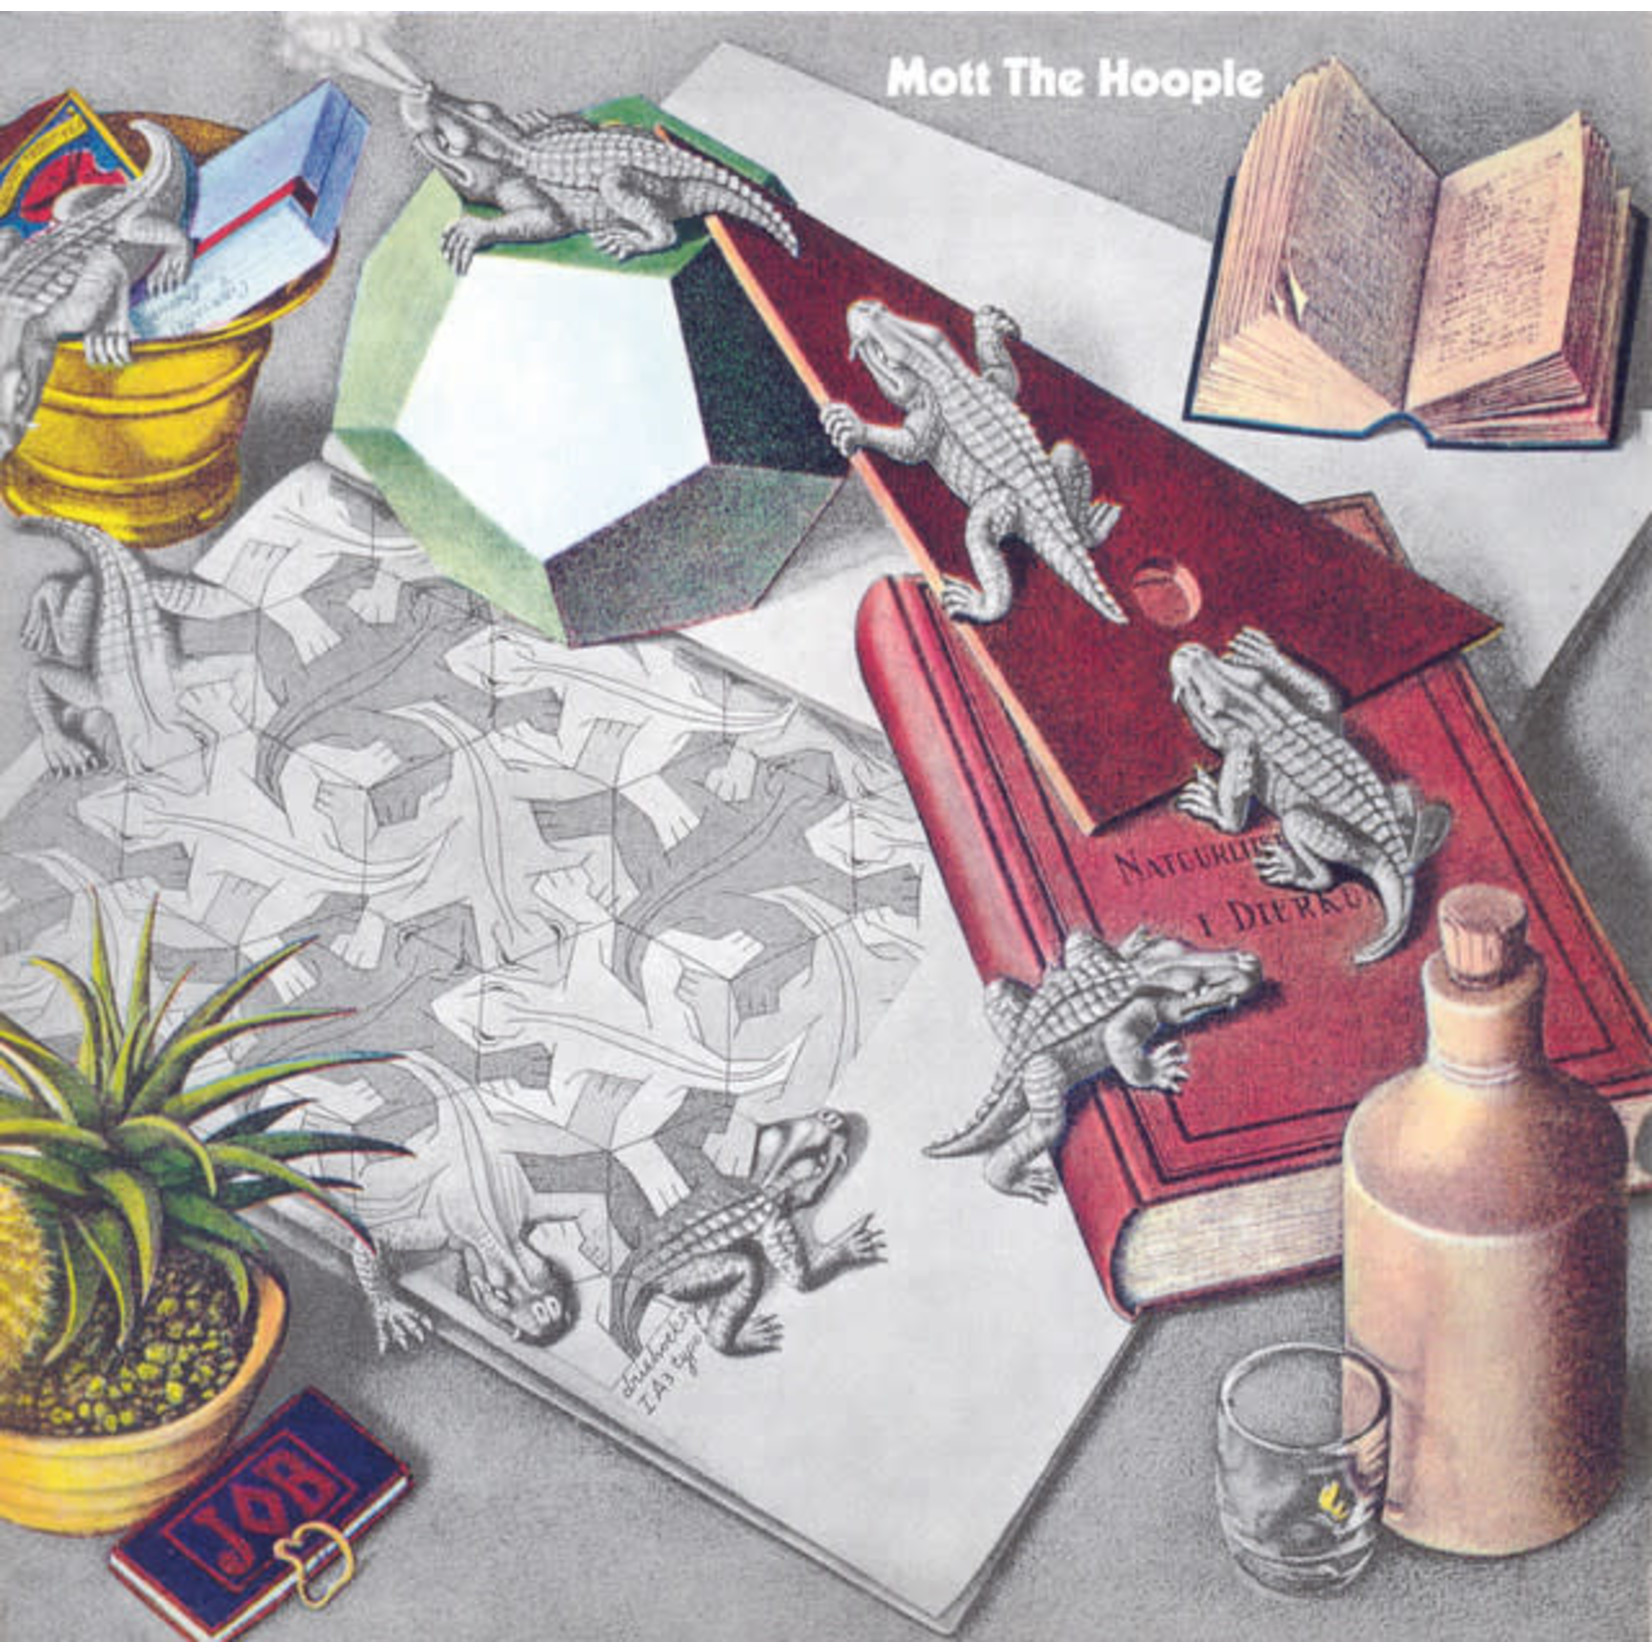 Vinyl Mott The Hoople - S/T